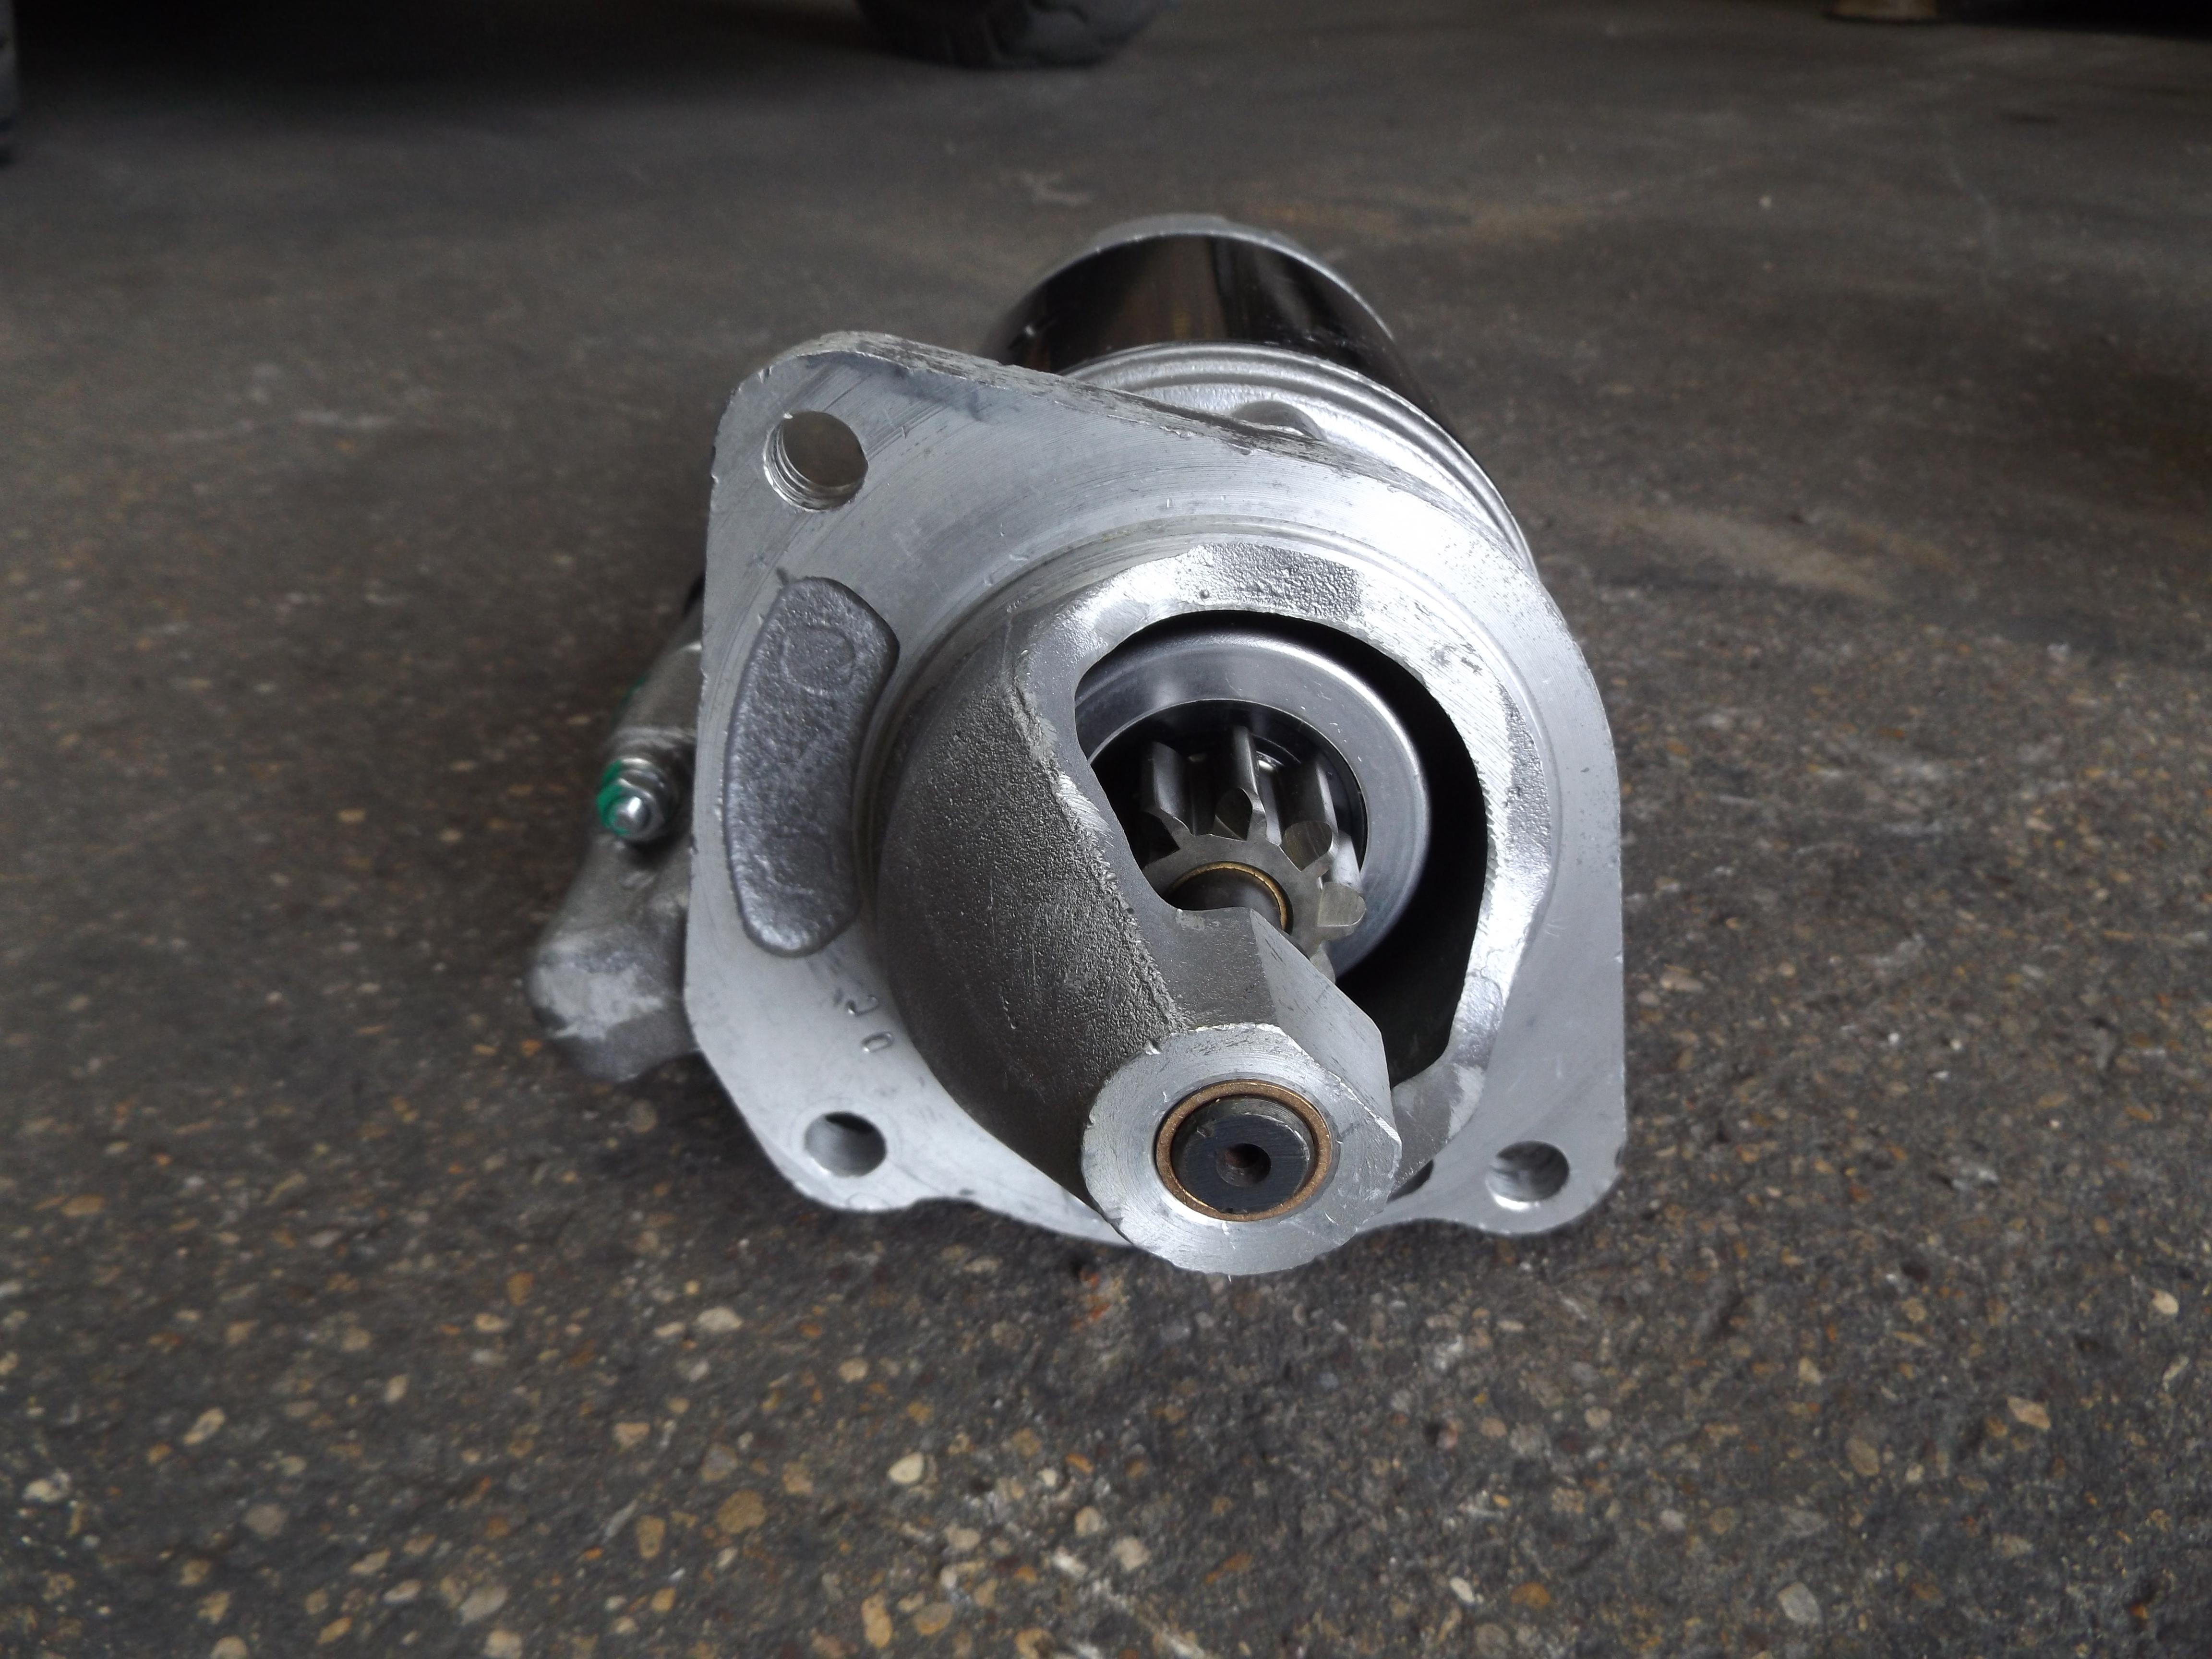 Lot 13605 - Land Rover 2.5 Diesel/ 2.5 Tdi Starter Motor P/No 432574